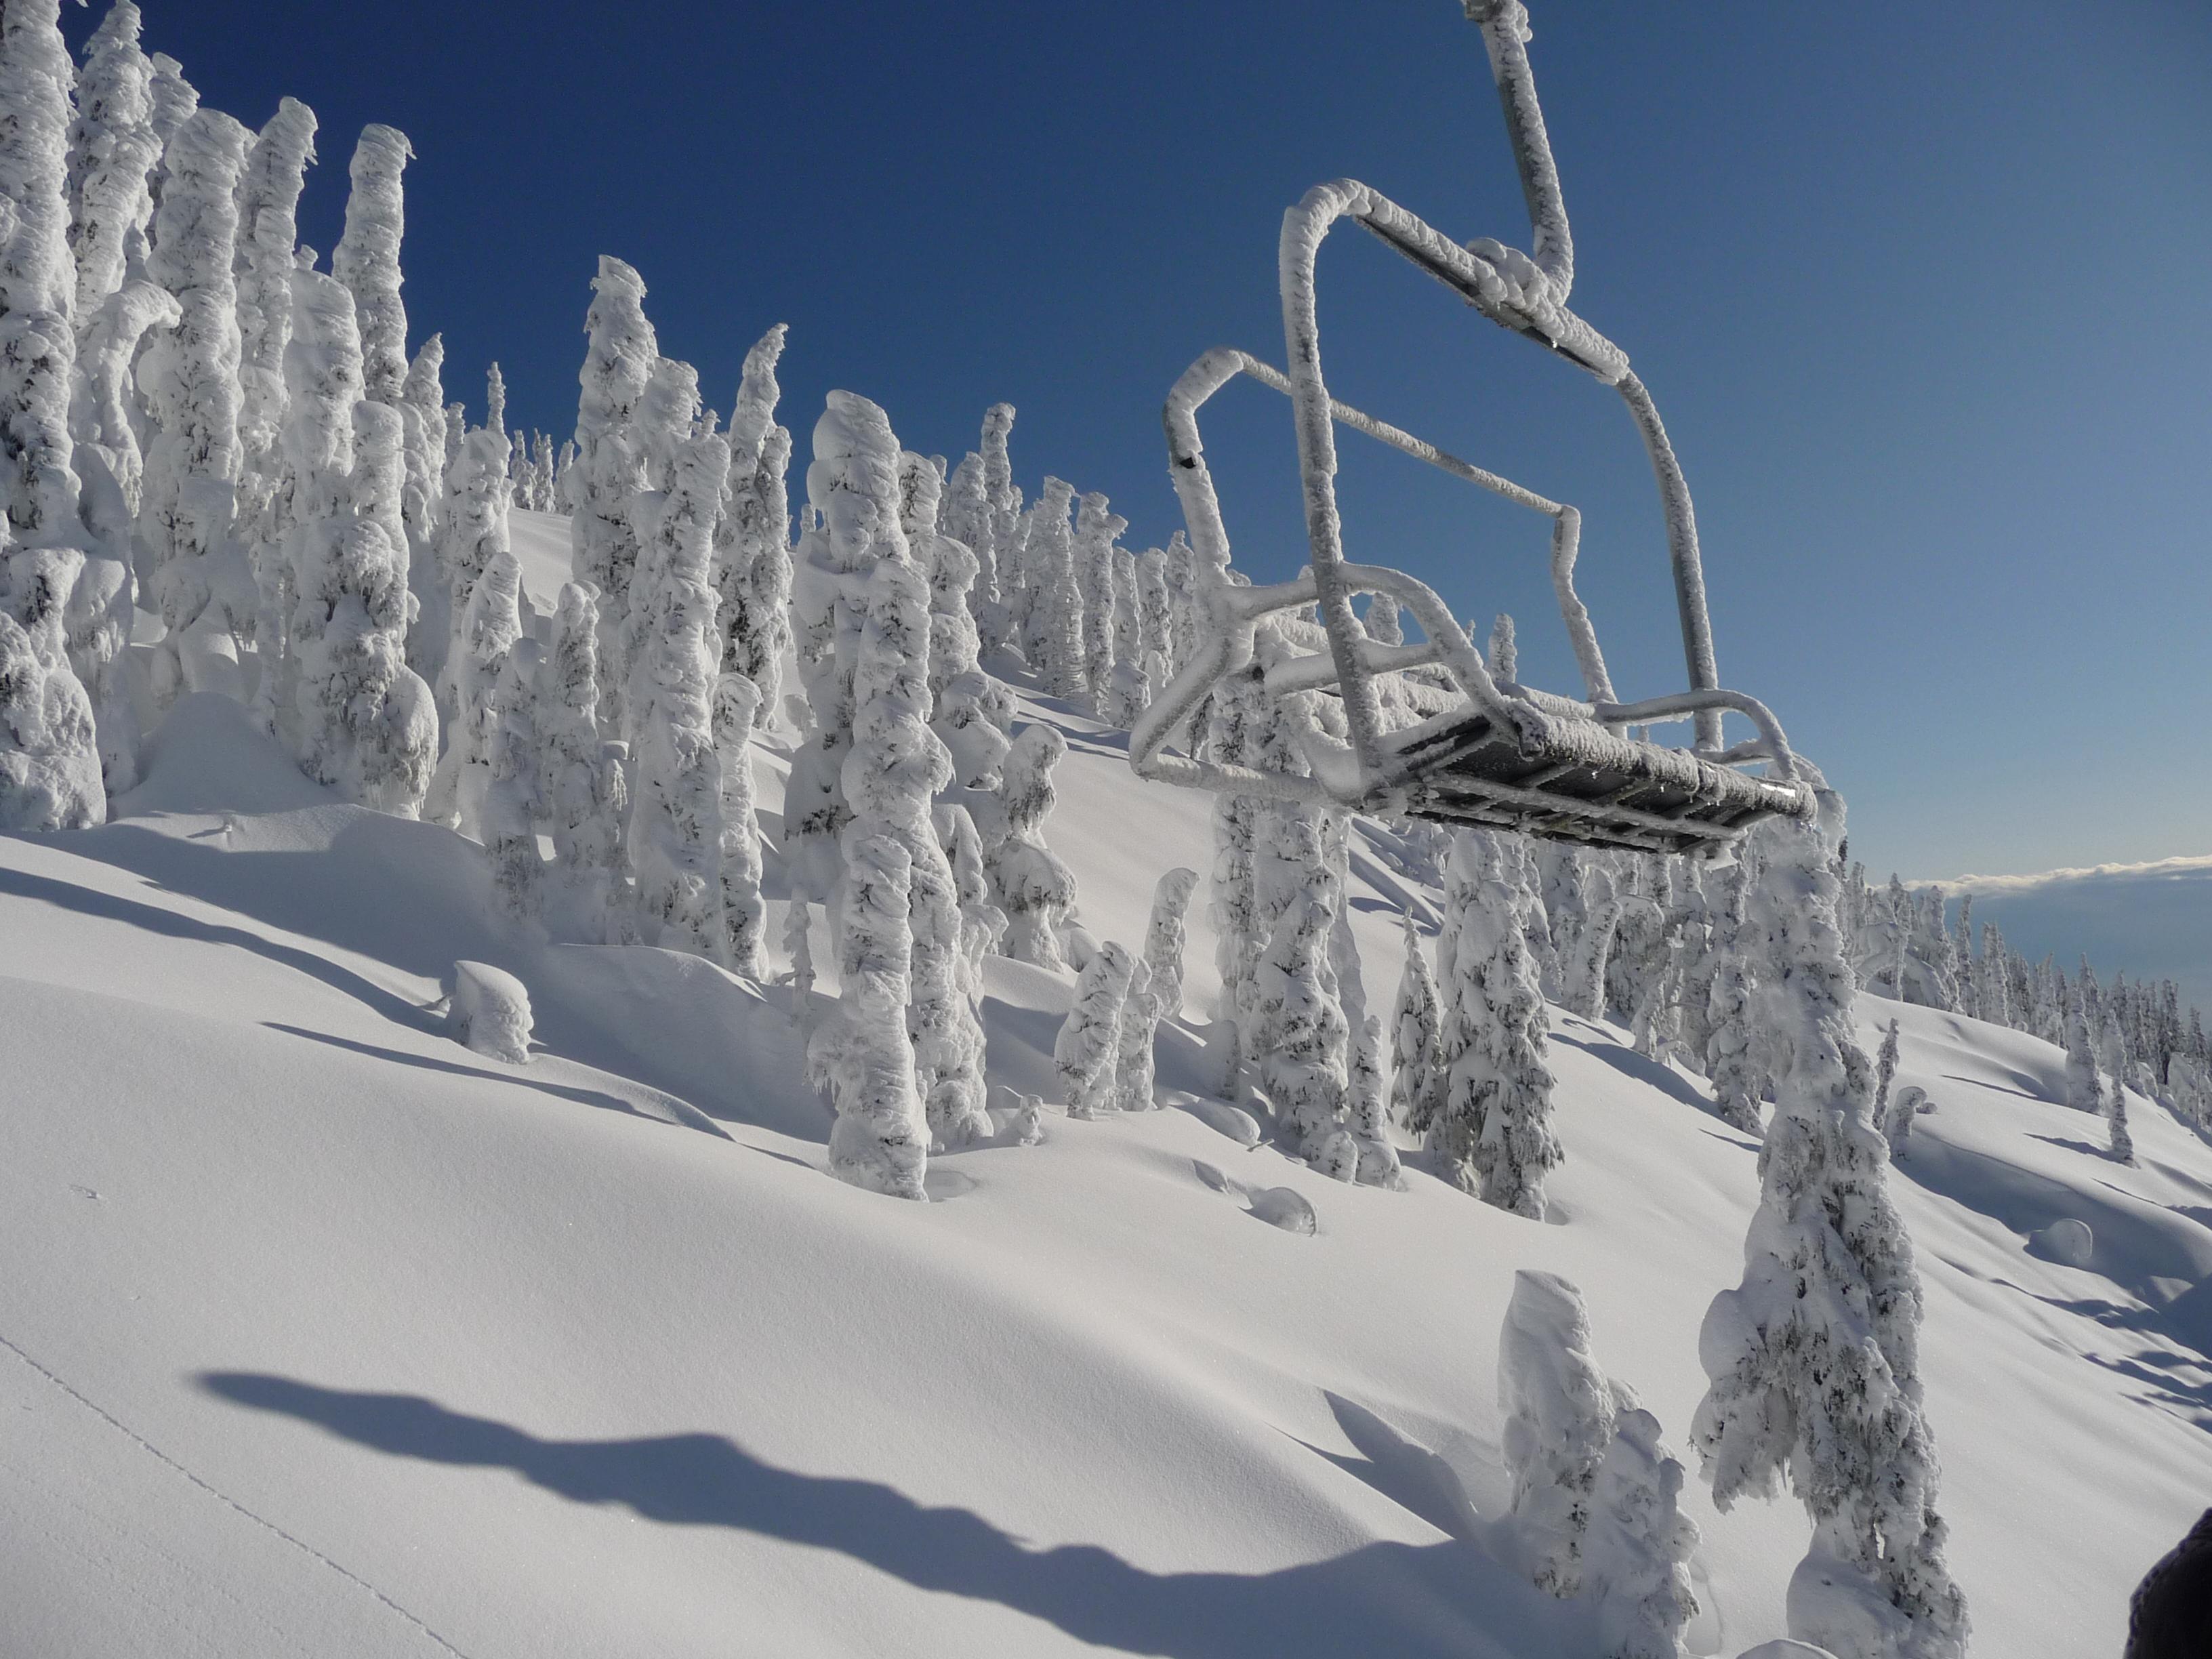 Mount Washington powder